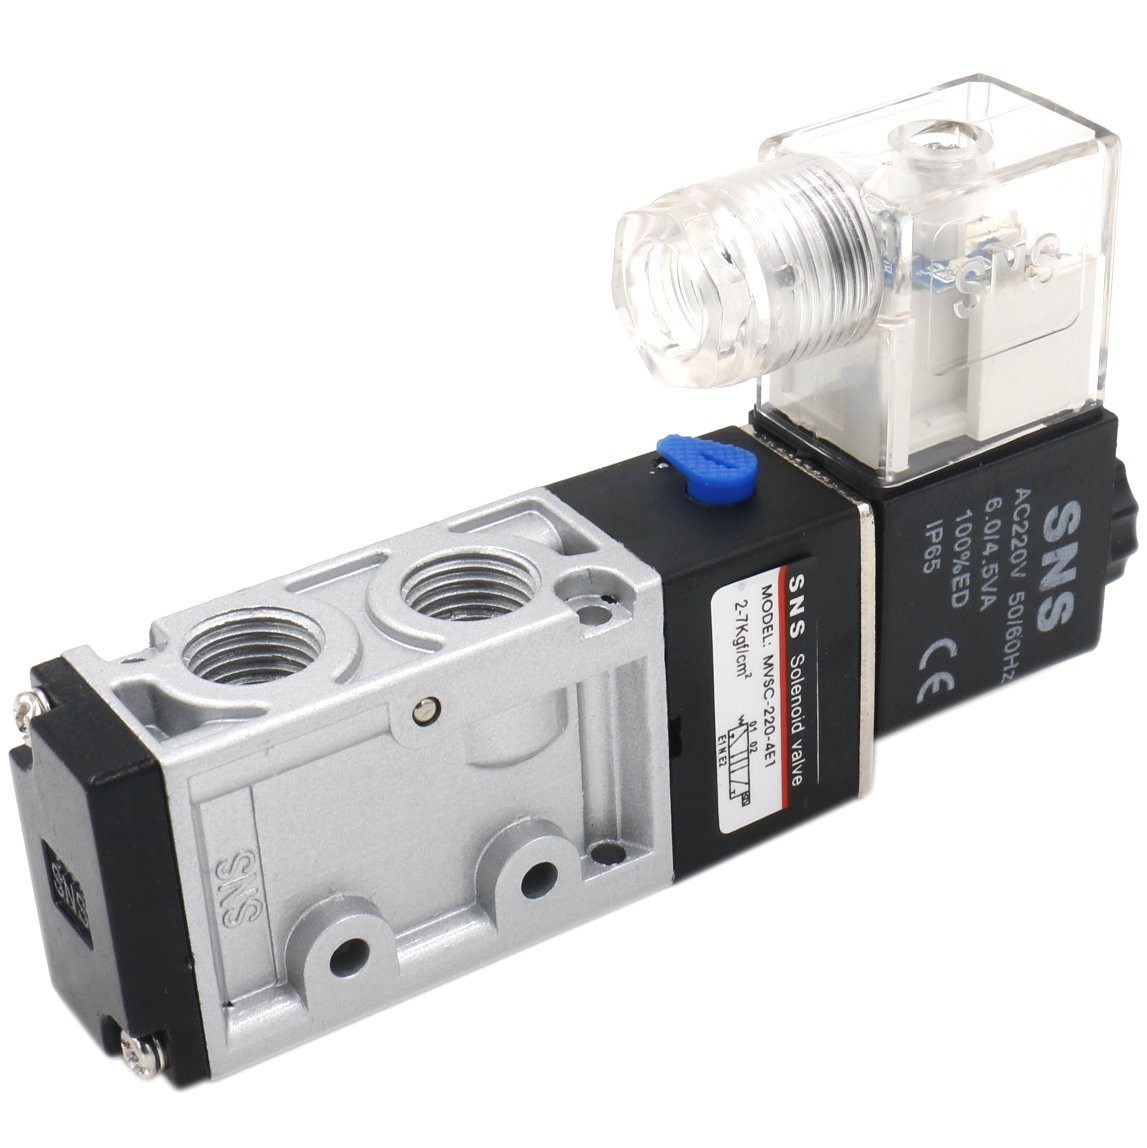 Heschen Electrical Pneumatic Solenoid Valve MVSC-220-4E1 220VAC PT1/4 5 Way 2 Position CE OEM